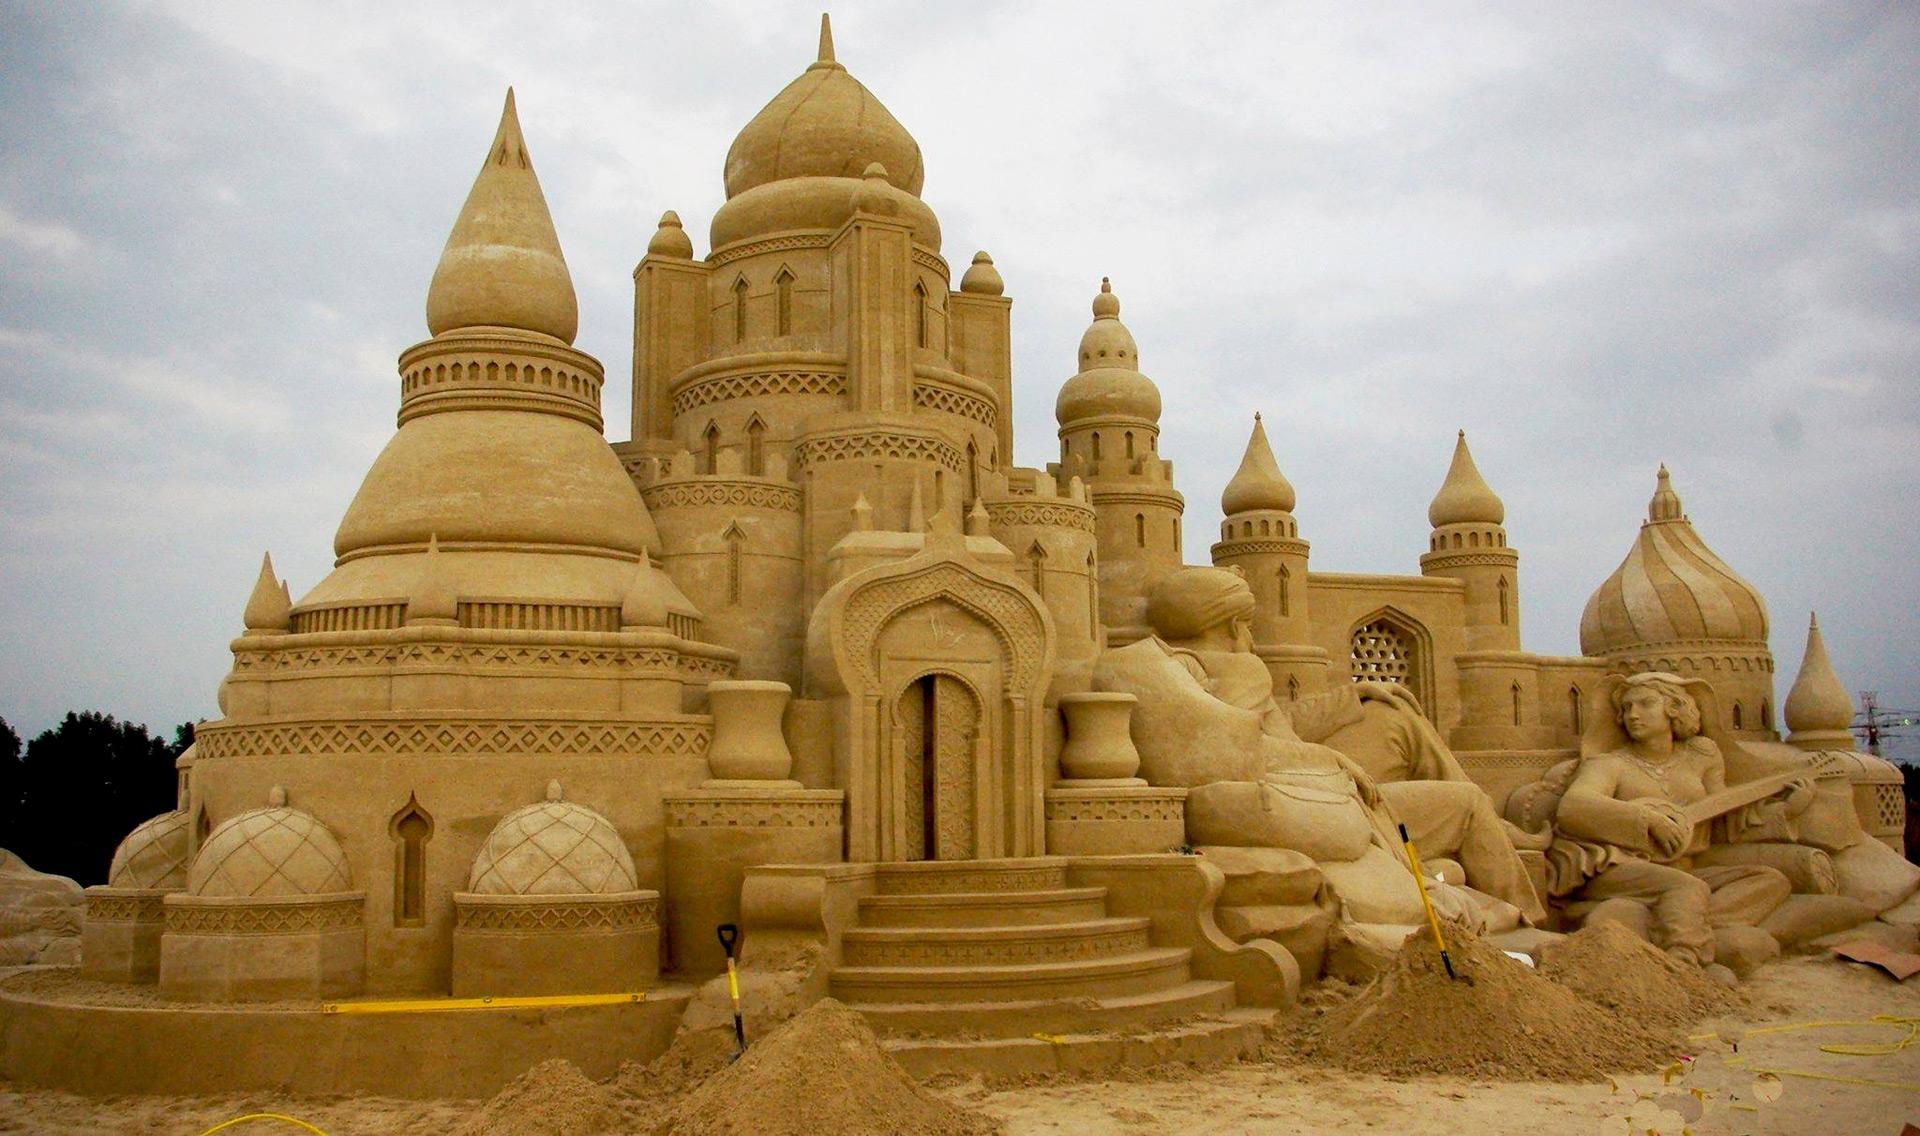 Sand-Sculpting-Company-SCAD_2.jpg